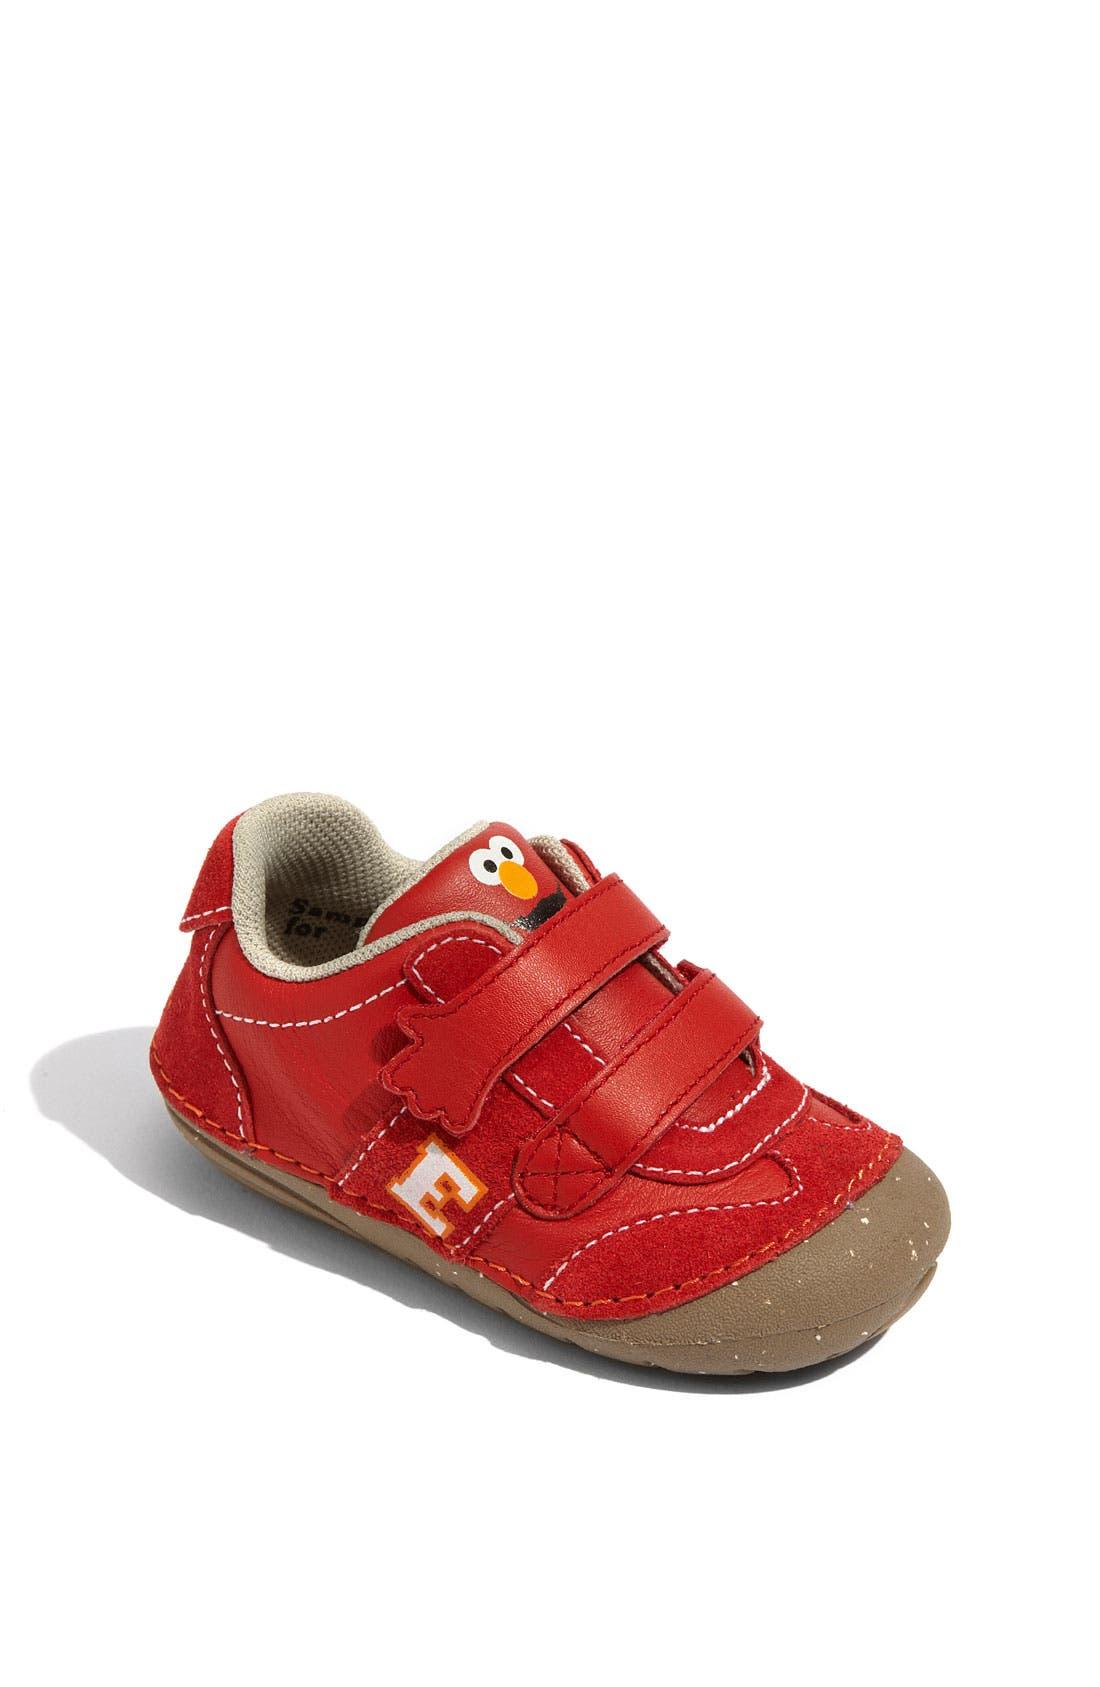 'Sesame Street<sup>®</sup> - Elmo' Sneaker,                             Main thumbnail 1, color,                             600